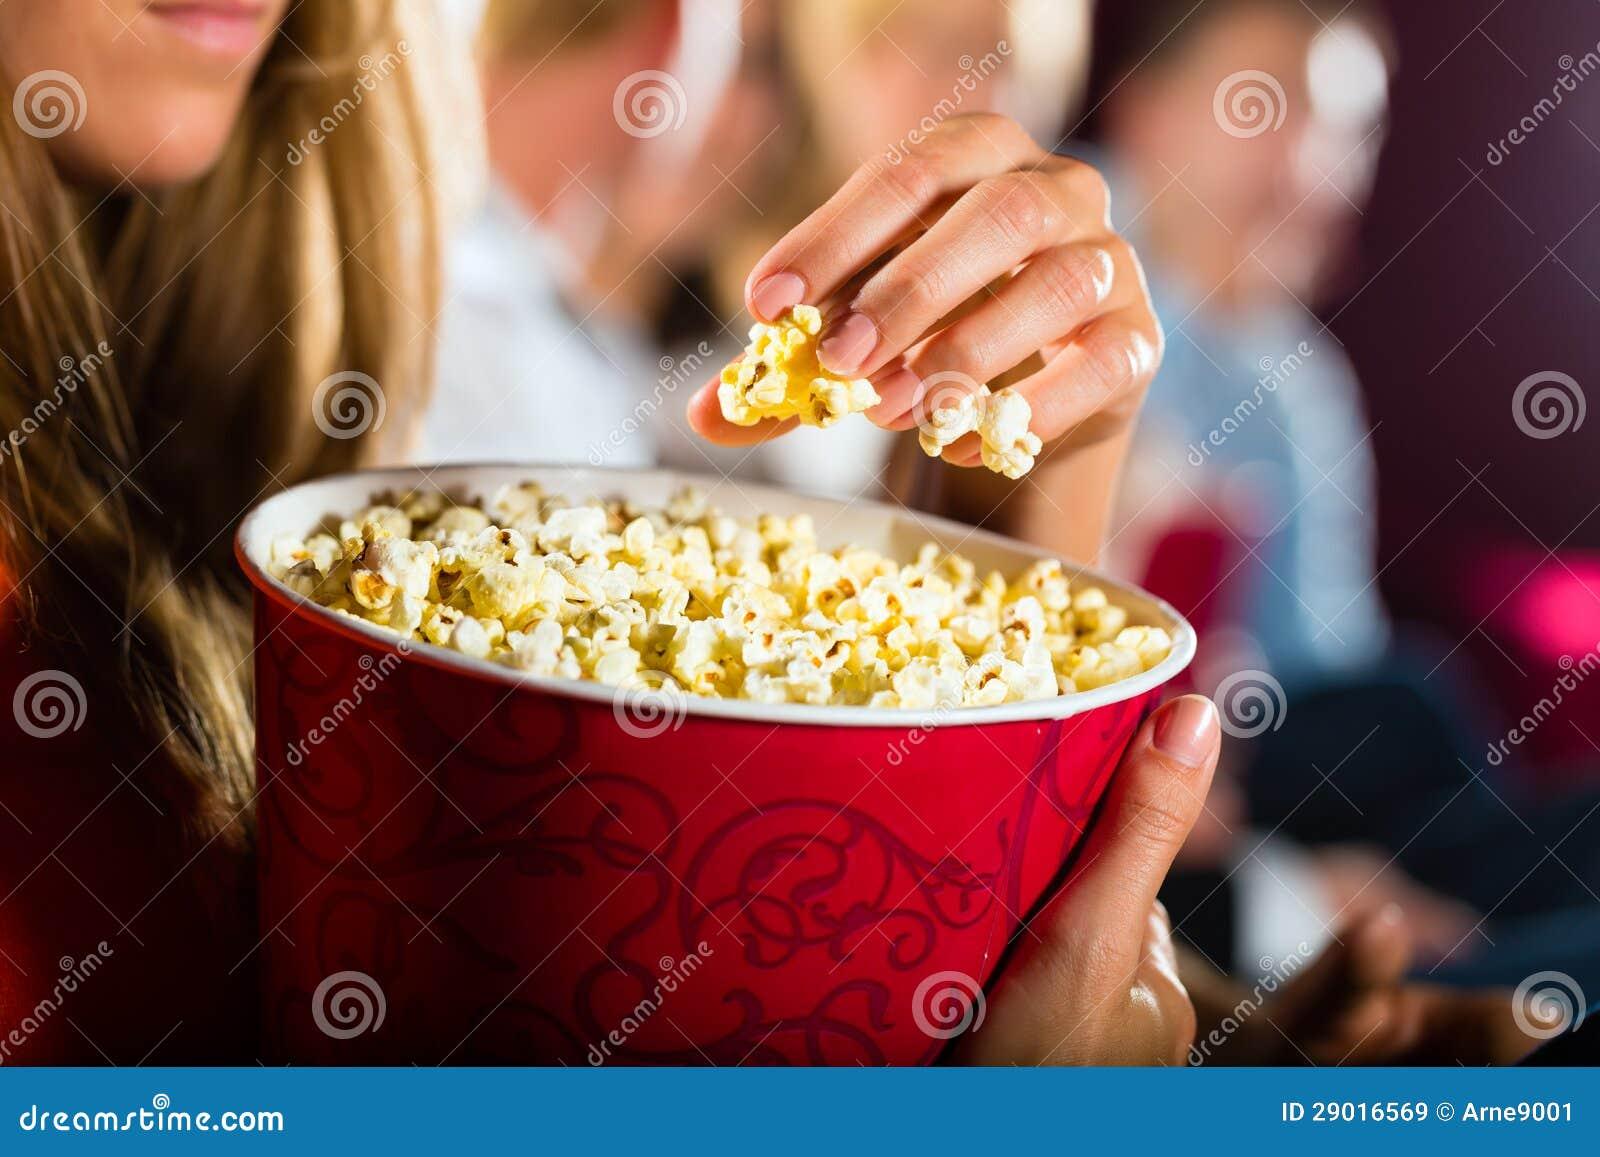 Girl eating popcorn in cinema or movie theater